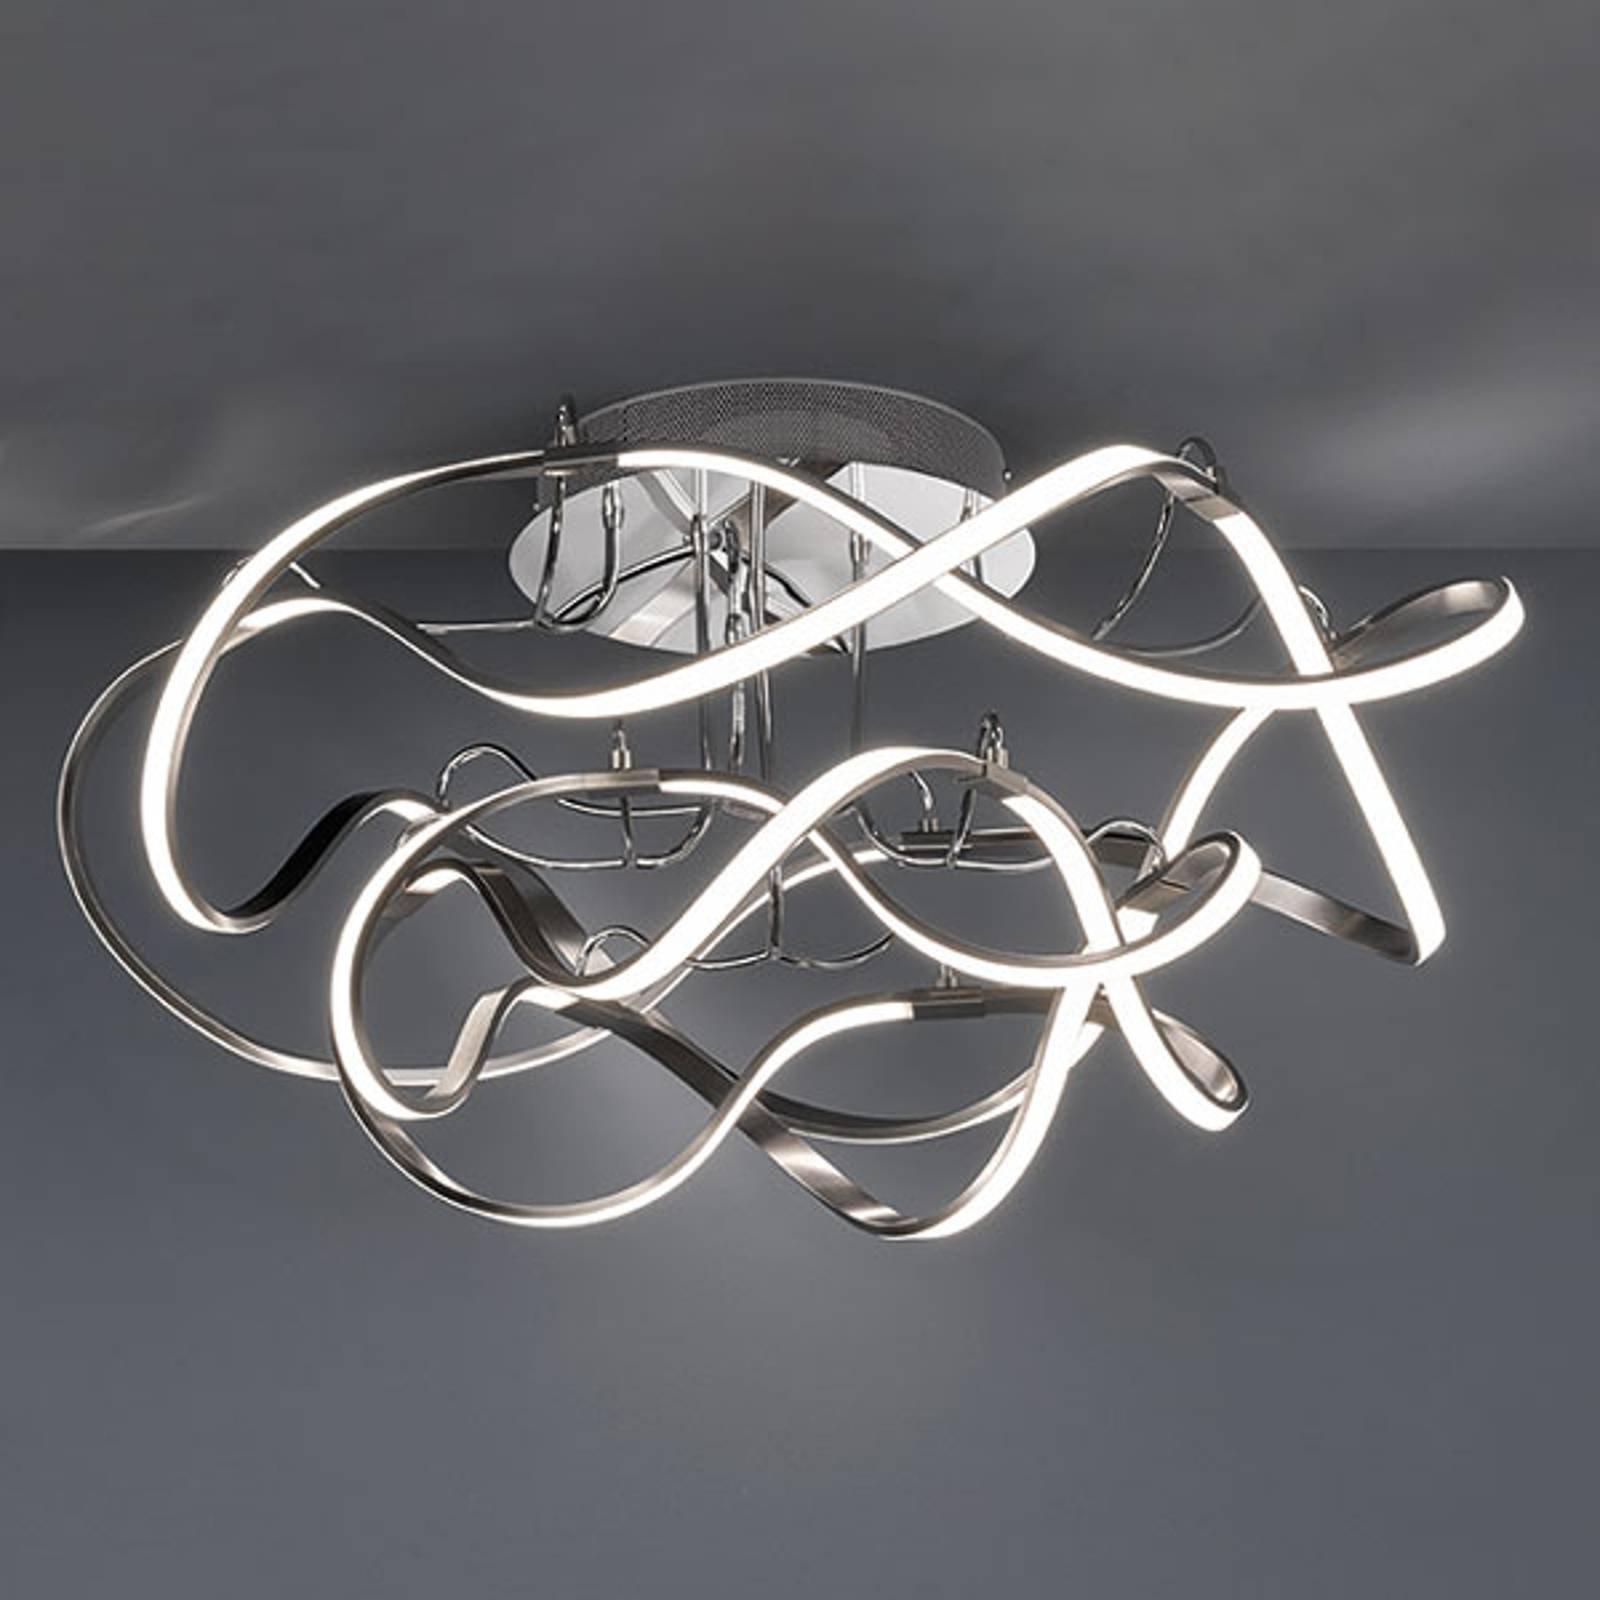 LED-taklampe Naxos, dimbar med veggbryter